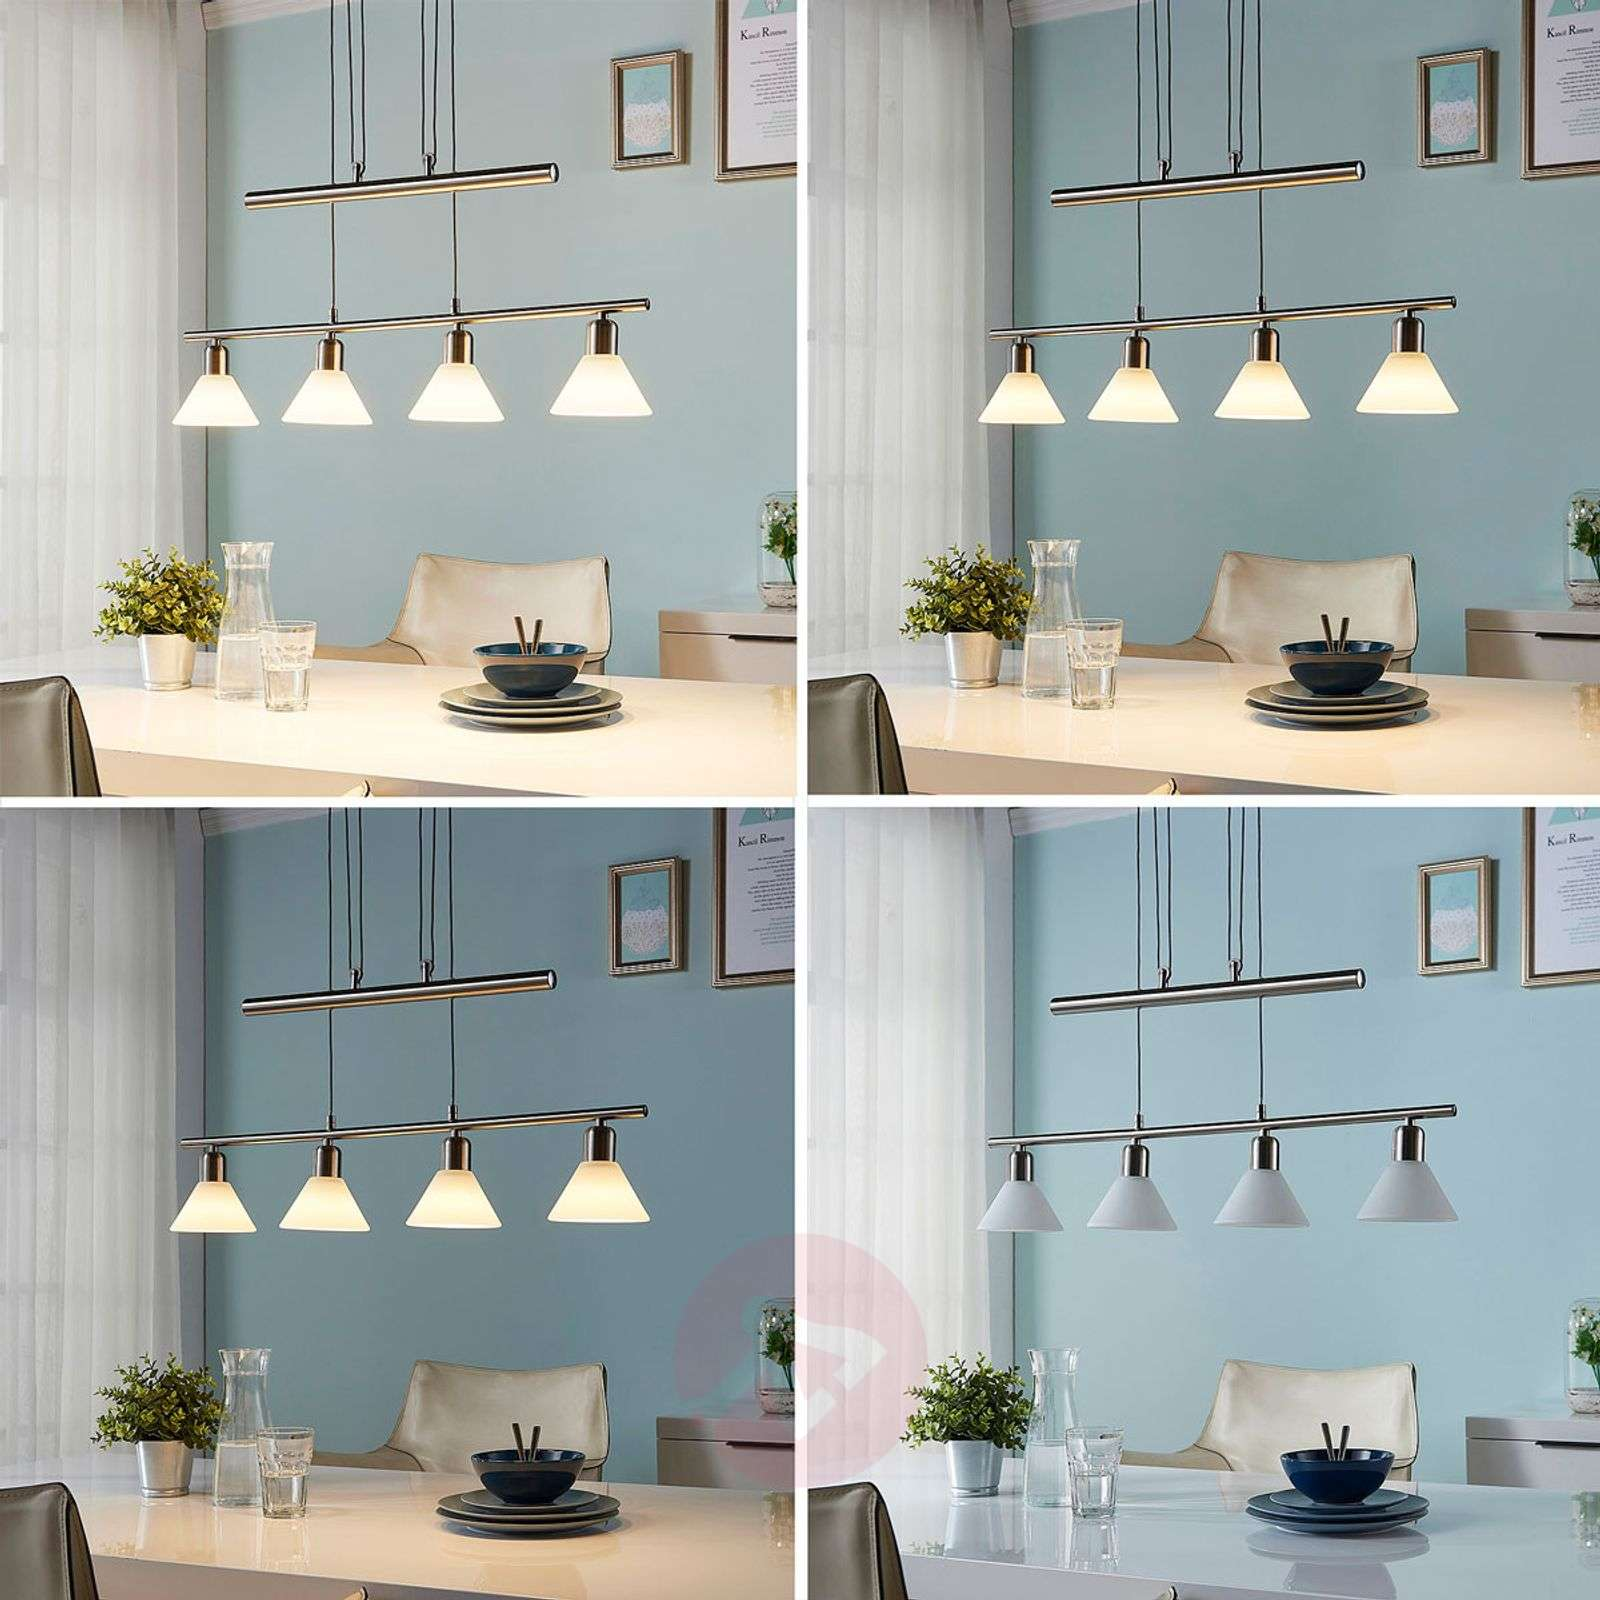 Eleasa easydim LED hanging light, 4-bulb, nickel-9621386-02